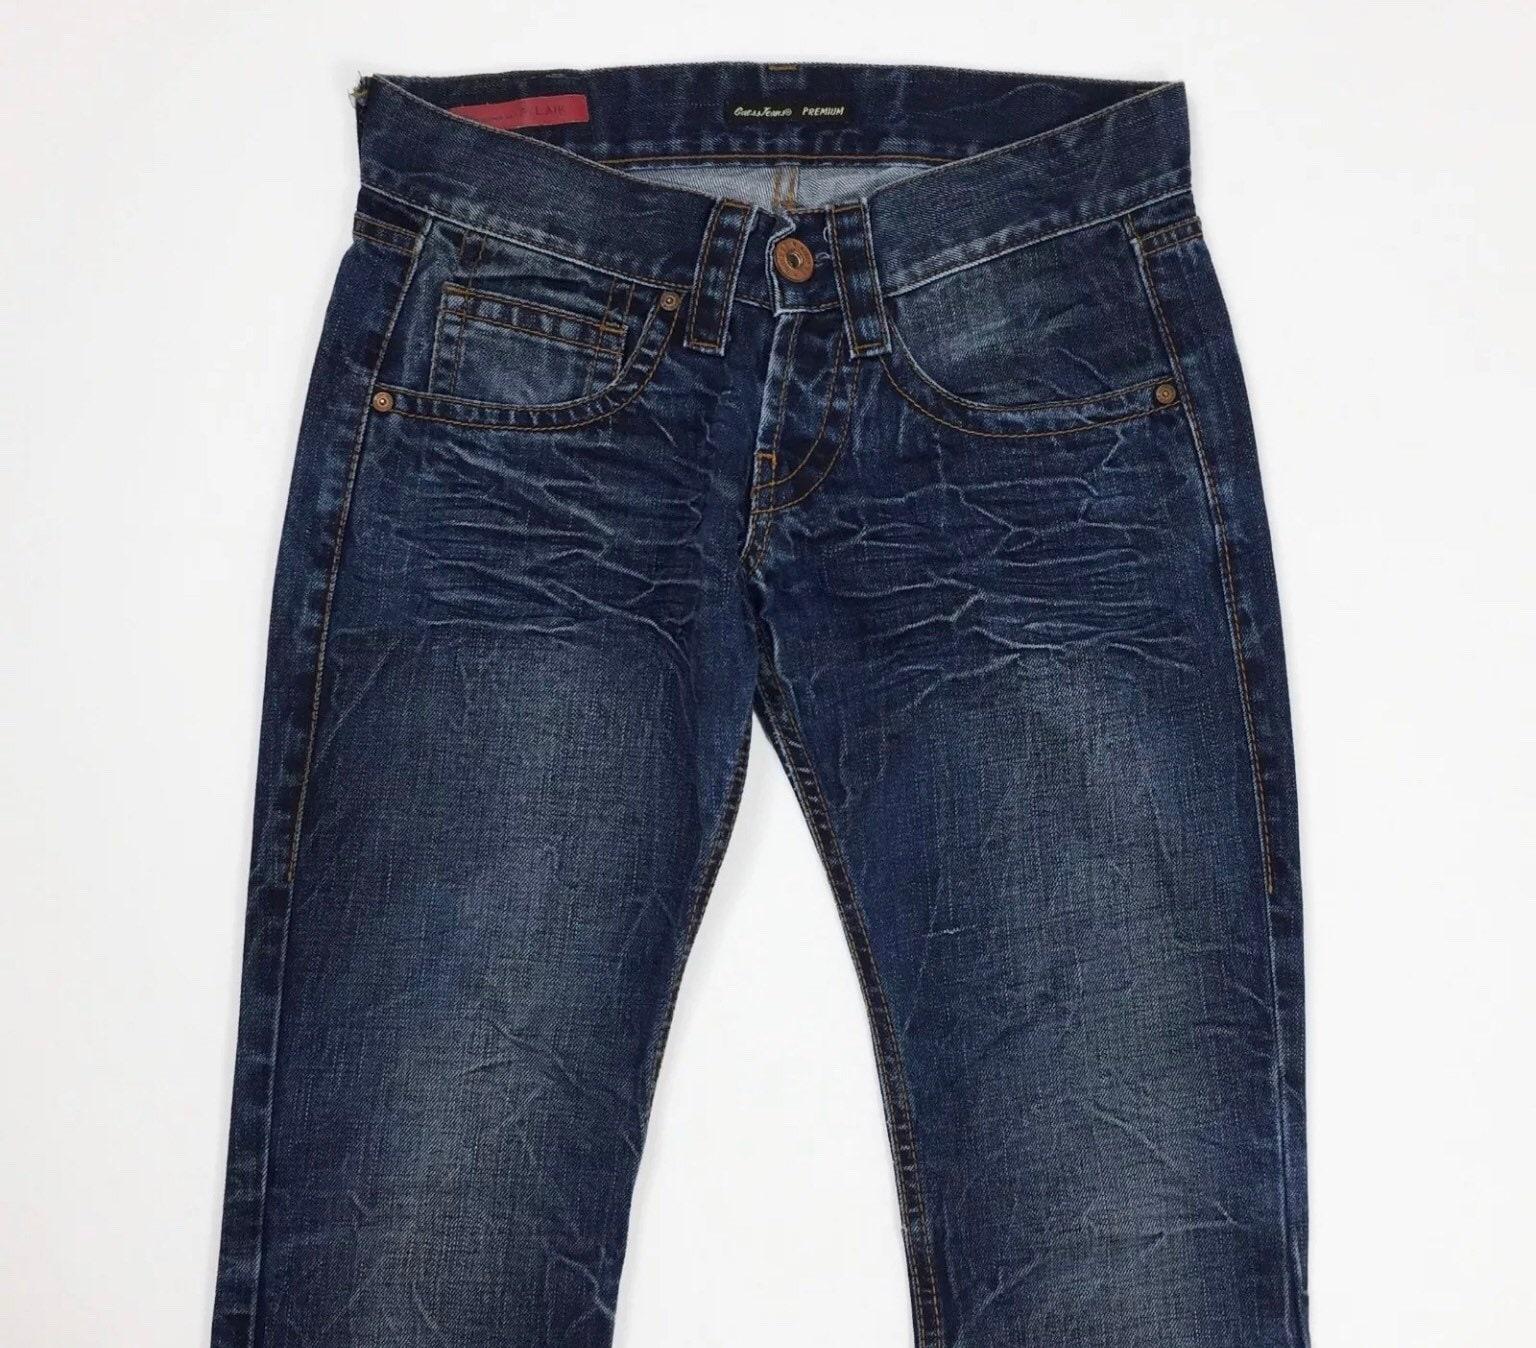 Guess jeans donna usato denim W27 tg 41 zampa bootcut svasati  5f4a08b8a9a